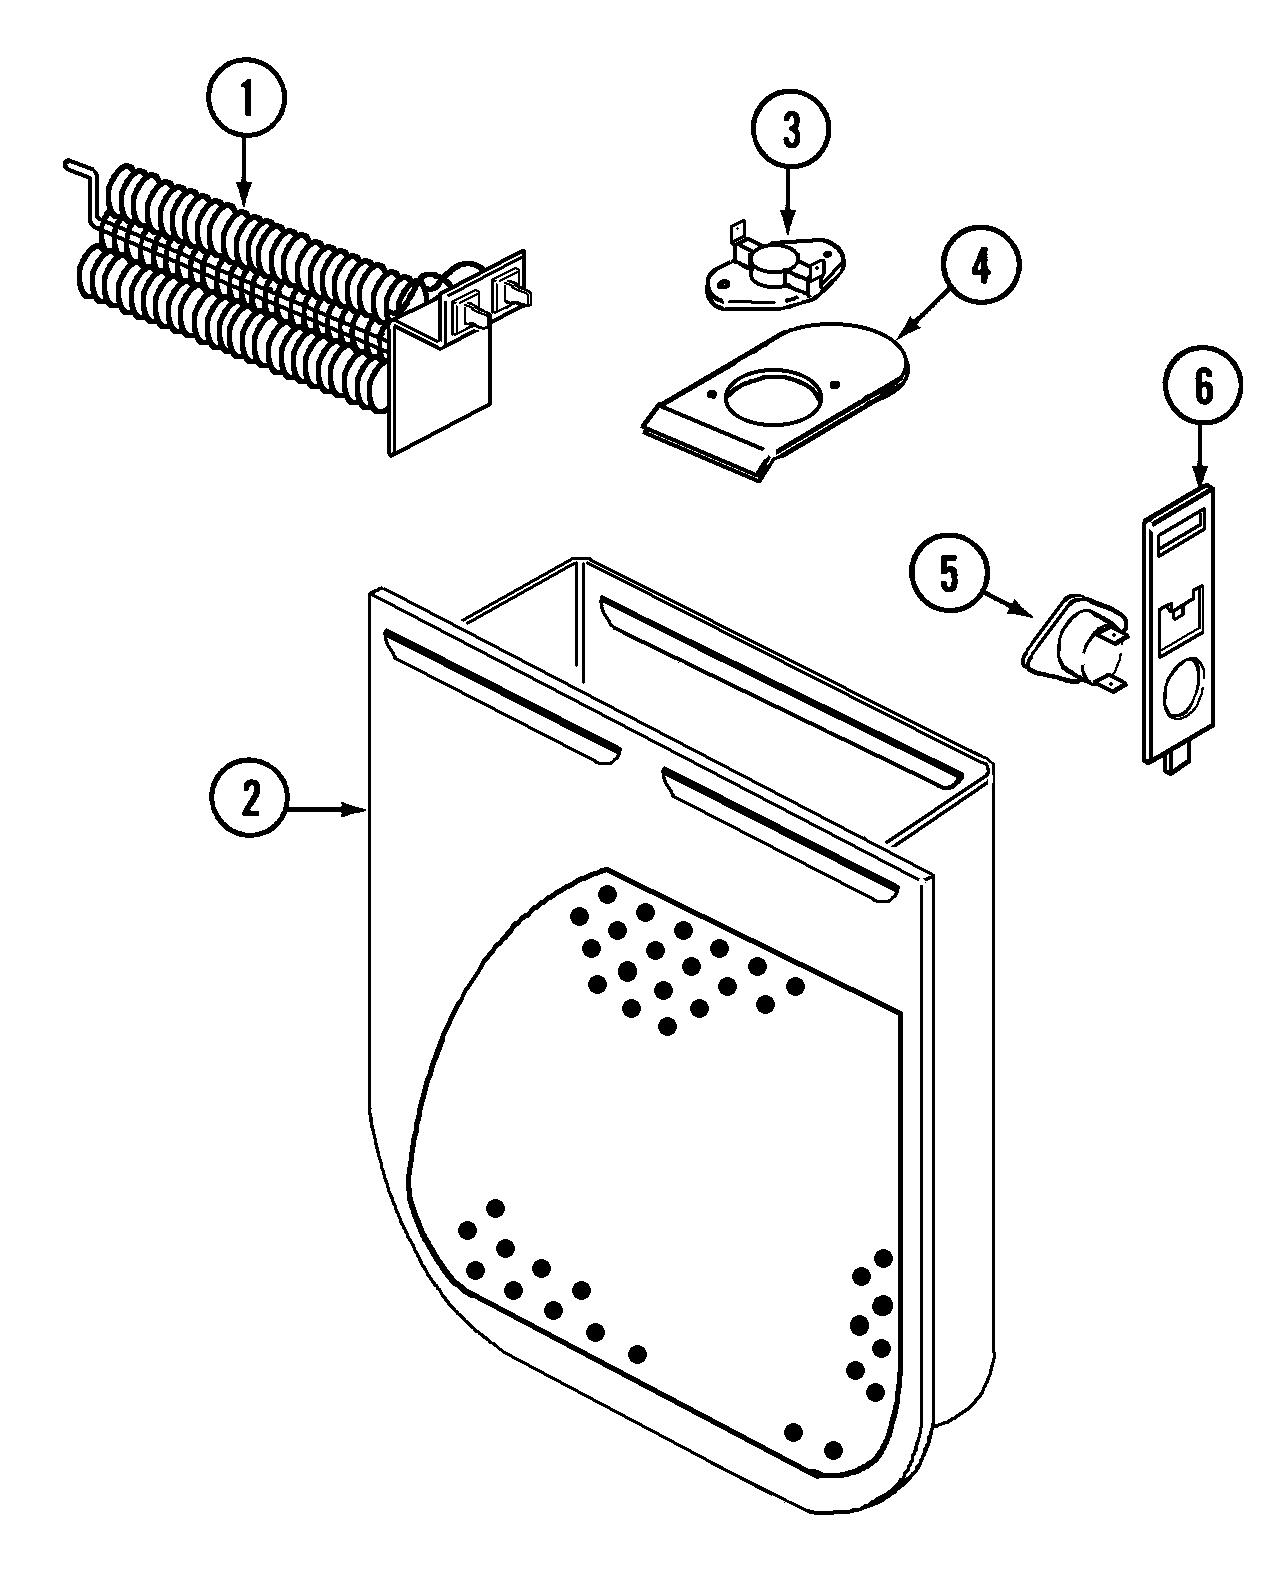 hight resolution of maytag hye3658ayw heater diagram